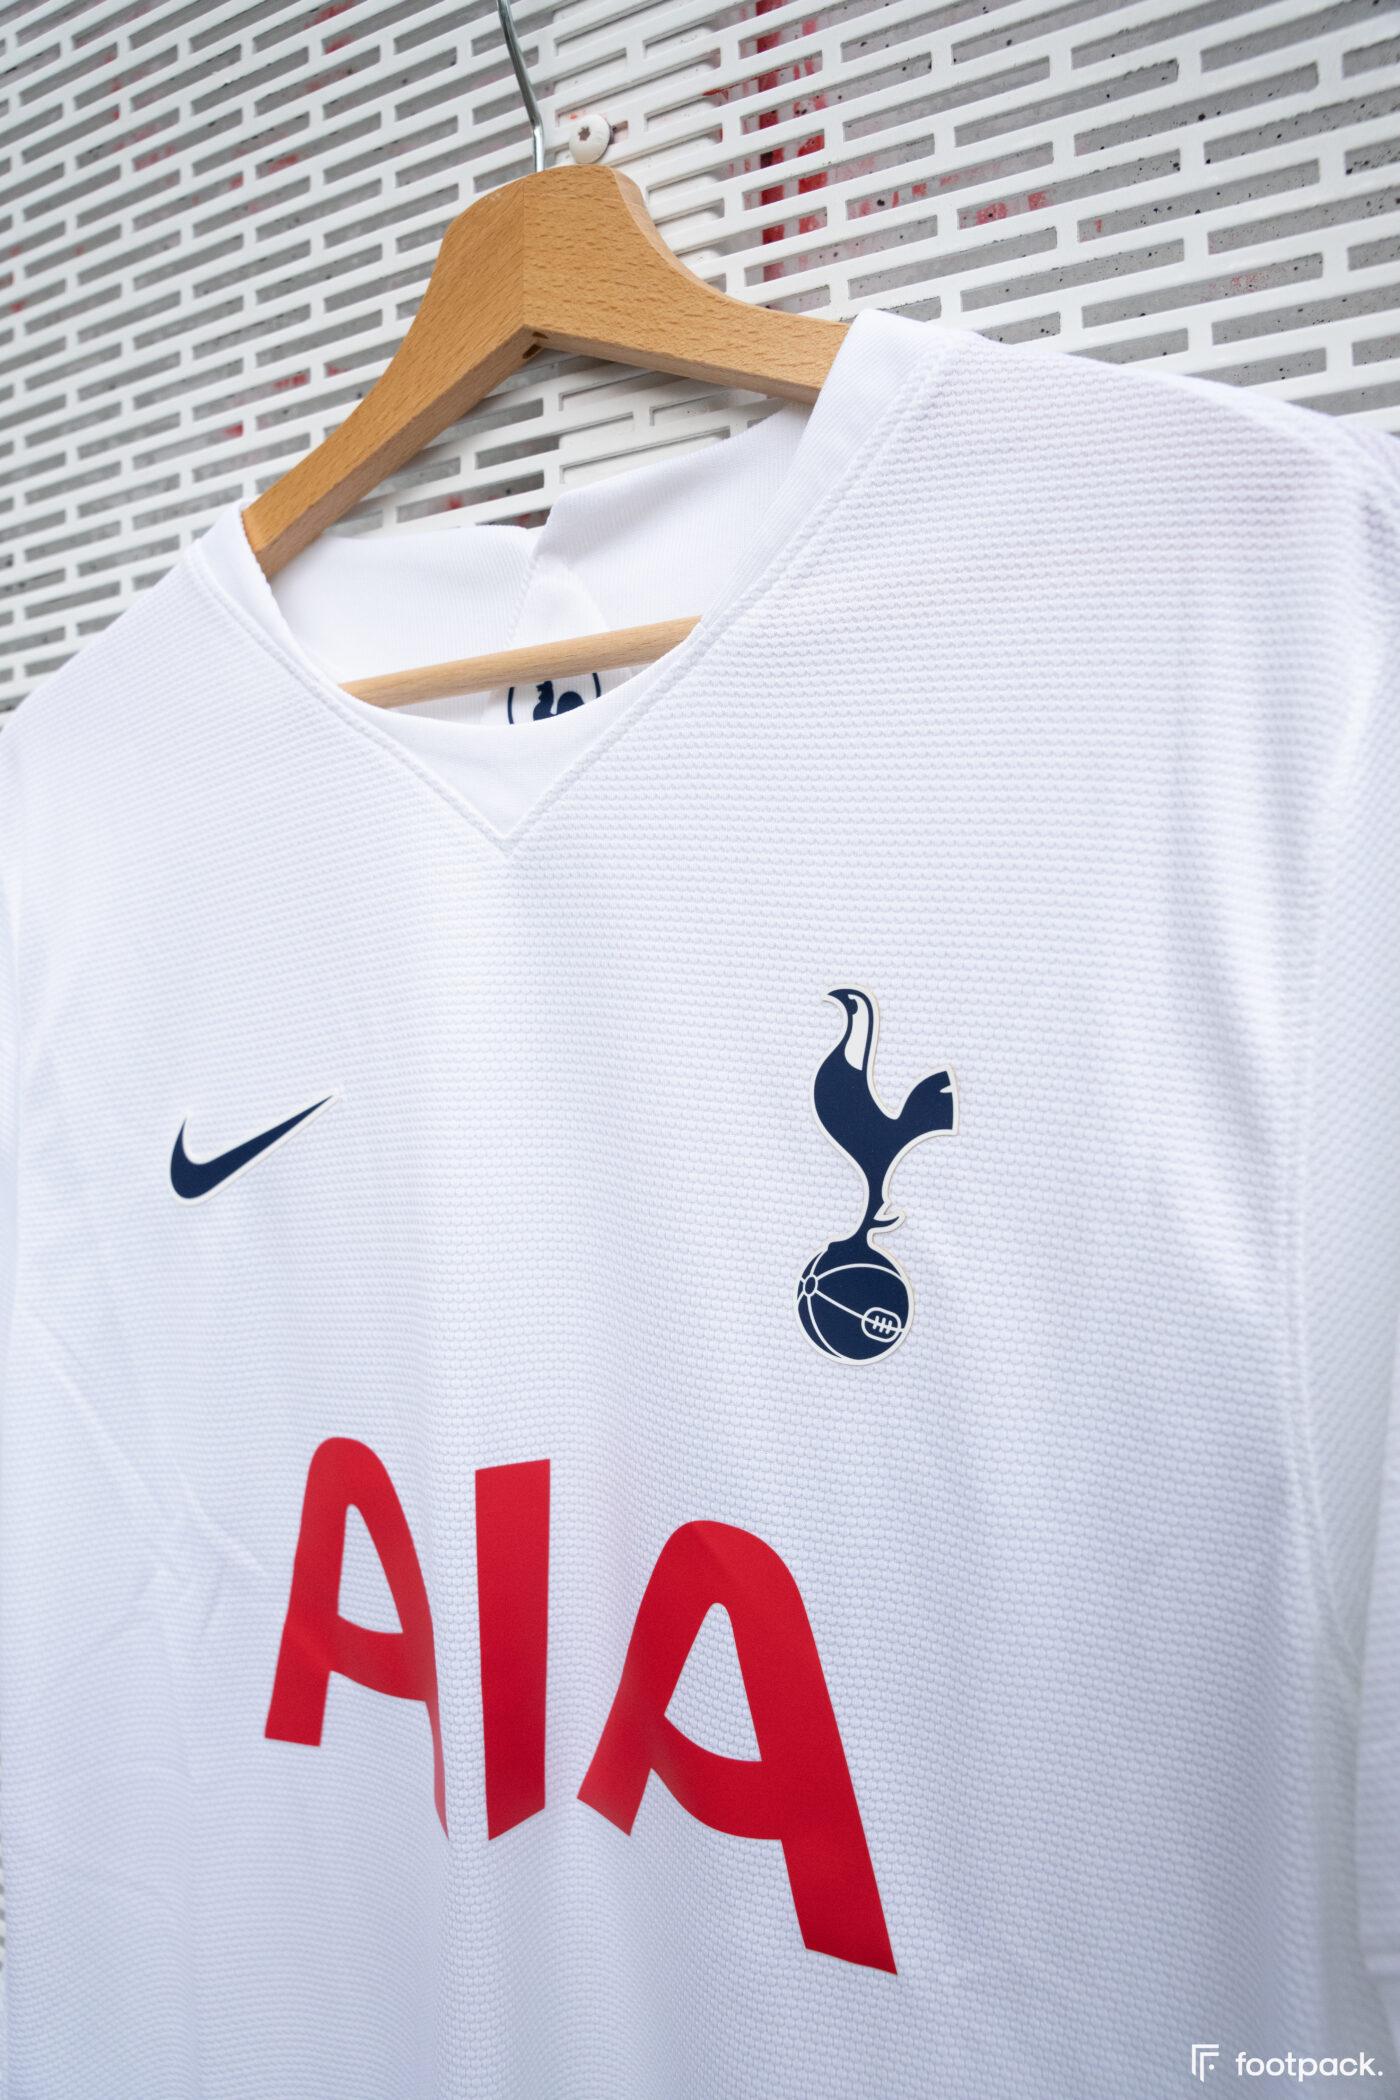 Maillot Tottenham 2021-2022 domicile - footpack